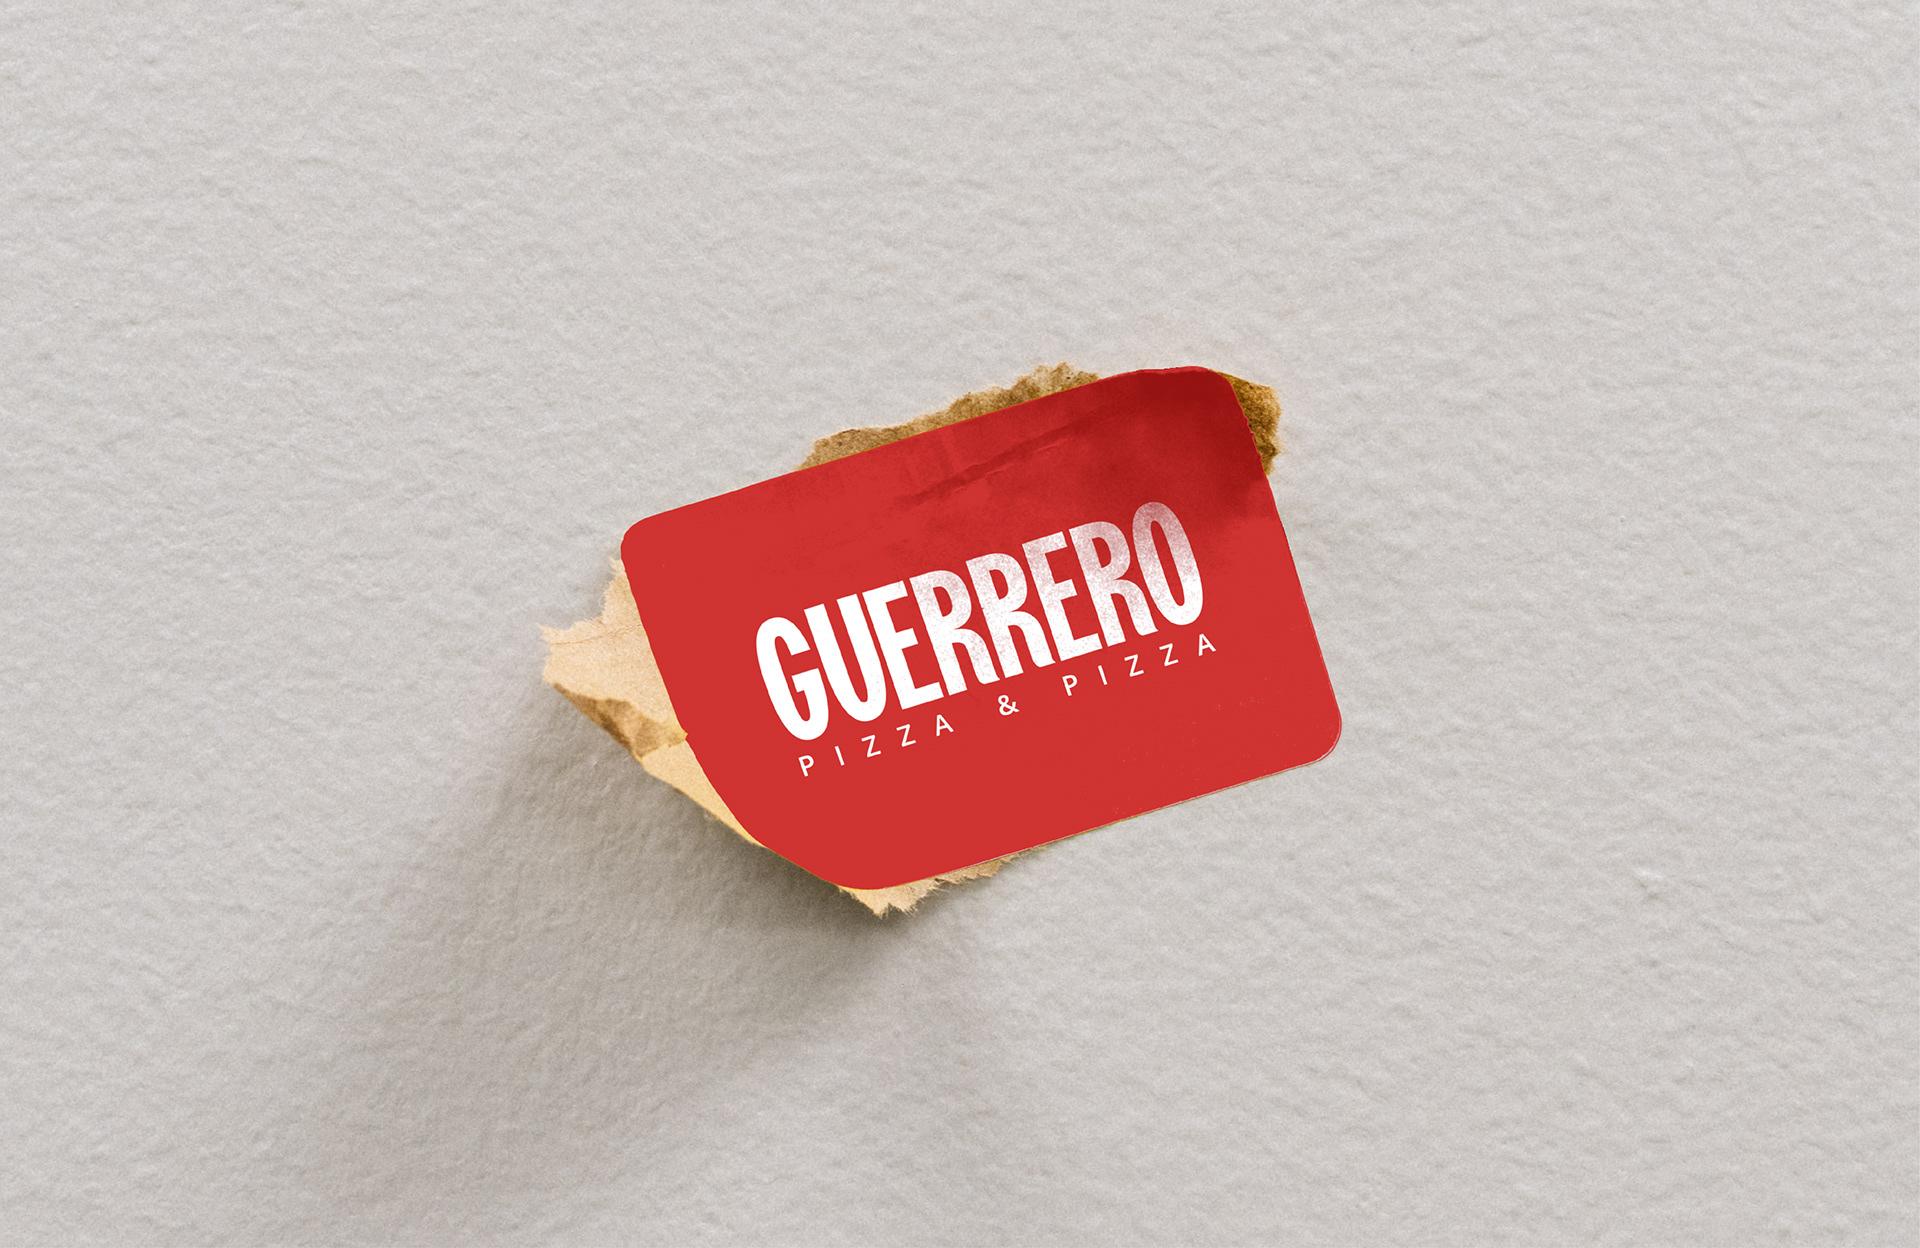 Brand Identity Created for Guerrero by Alejo Ojeda